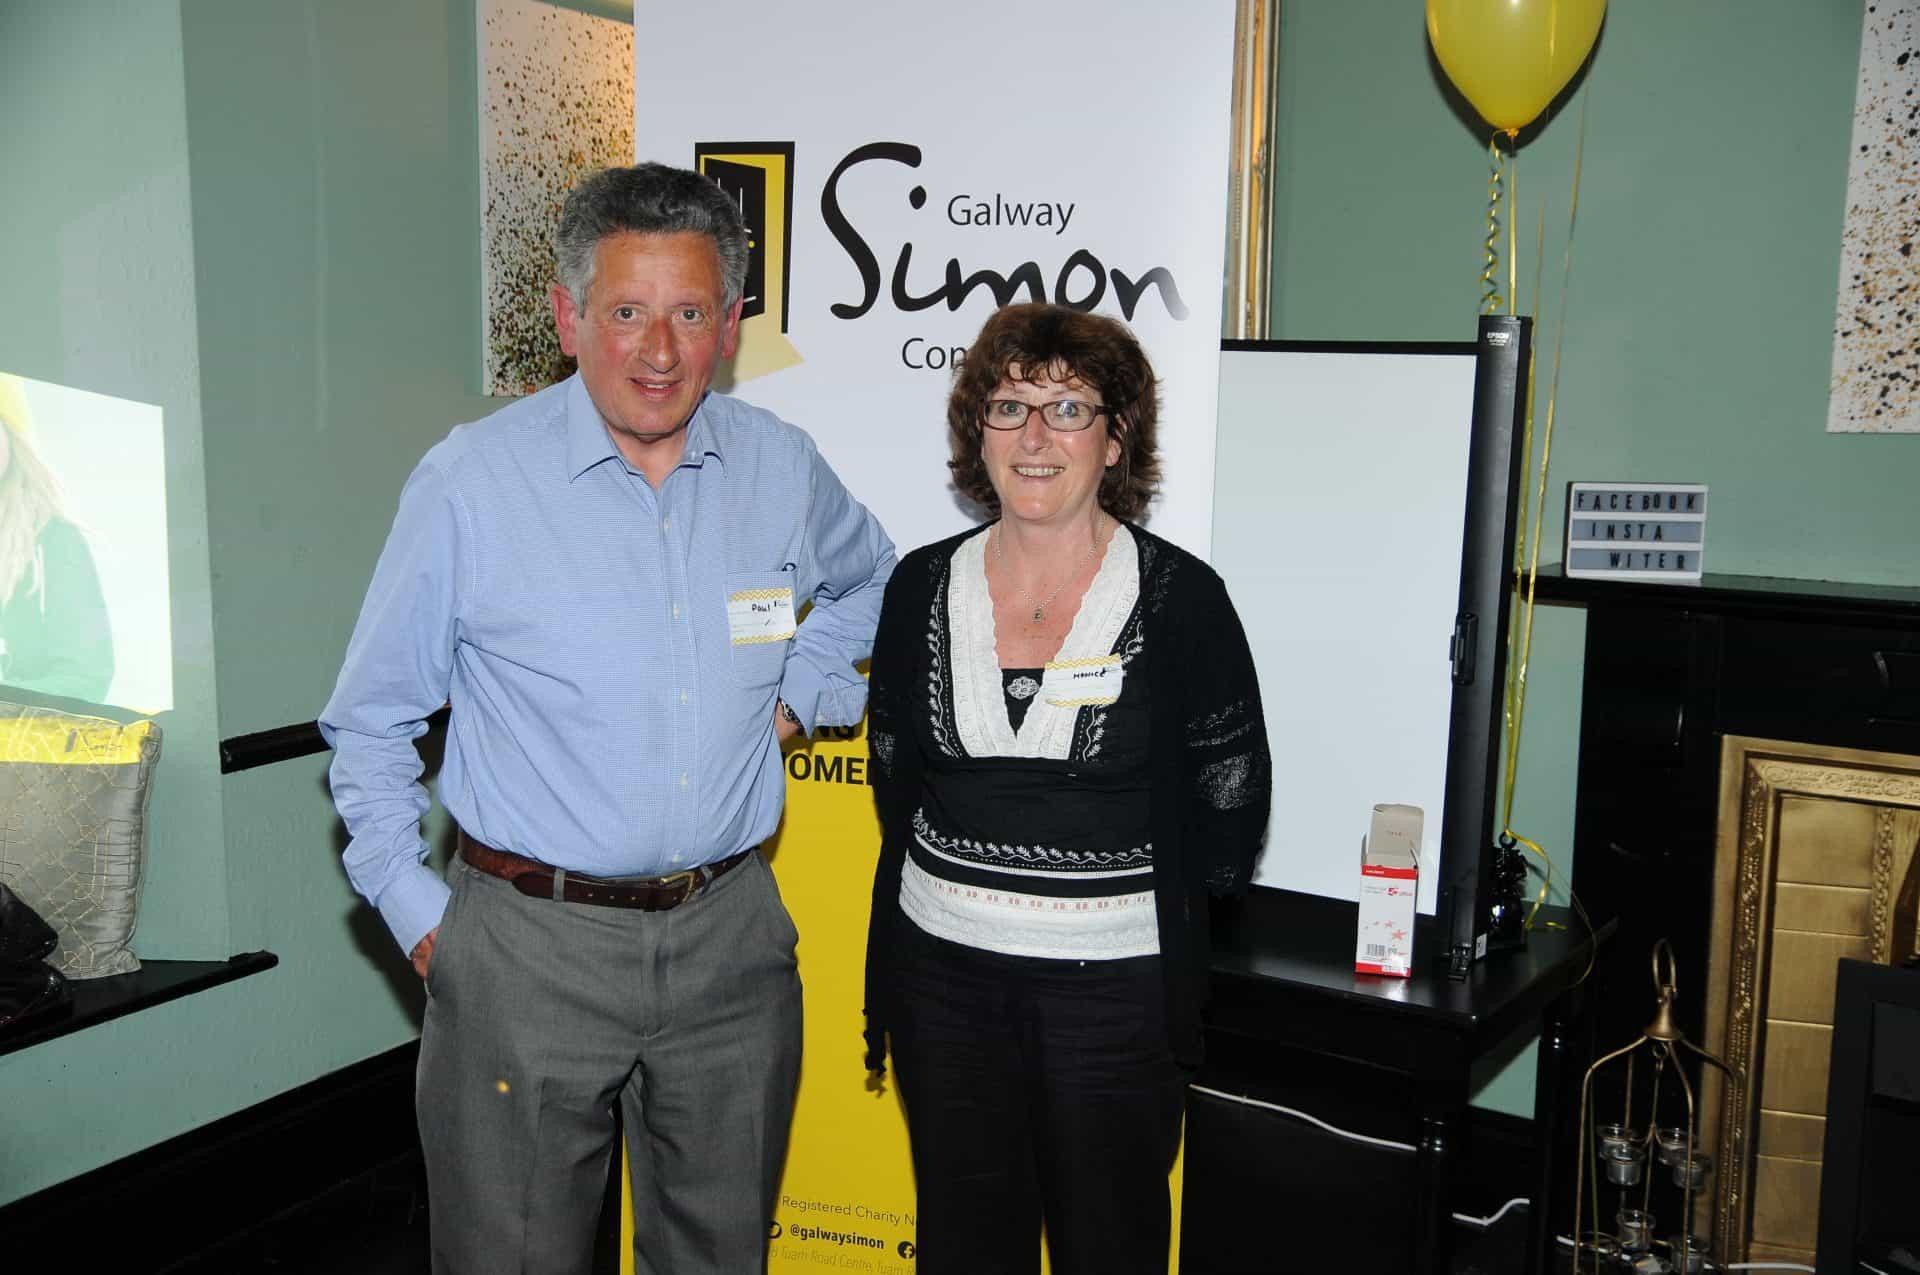 Paul Duffy & Monica Coughlan, Galway Simon Community Volunteers